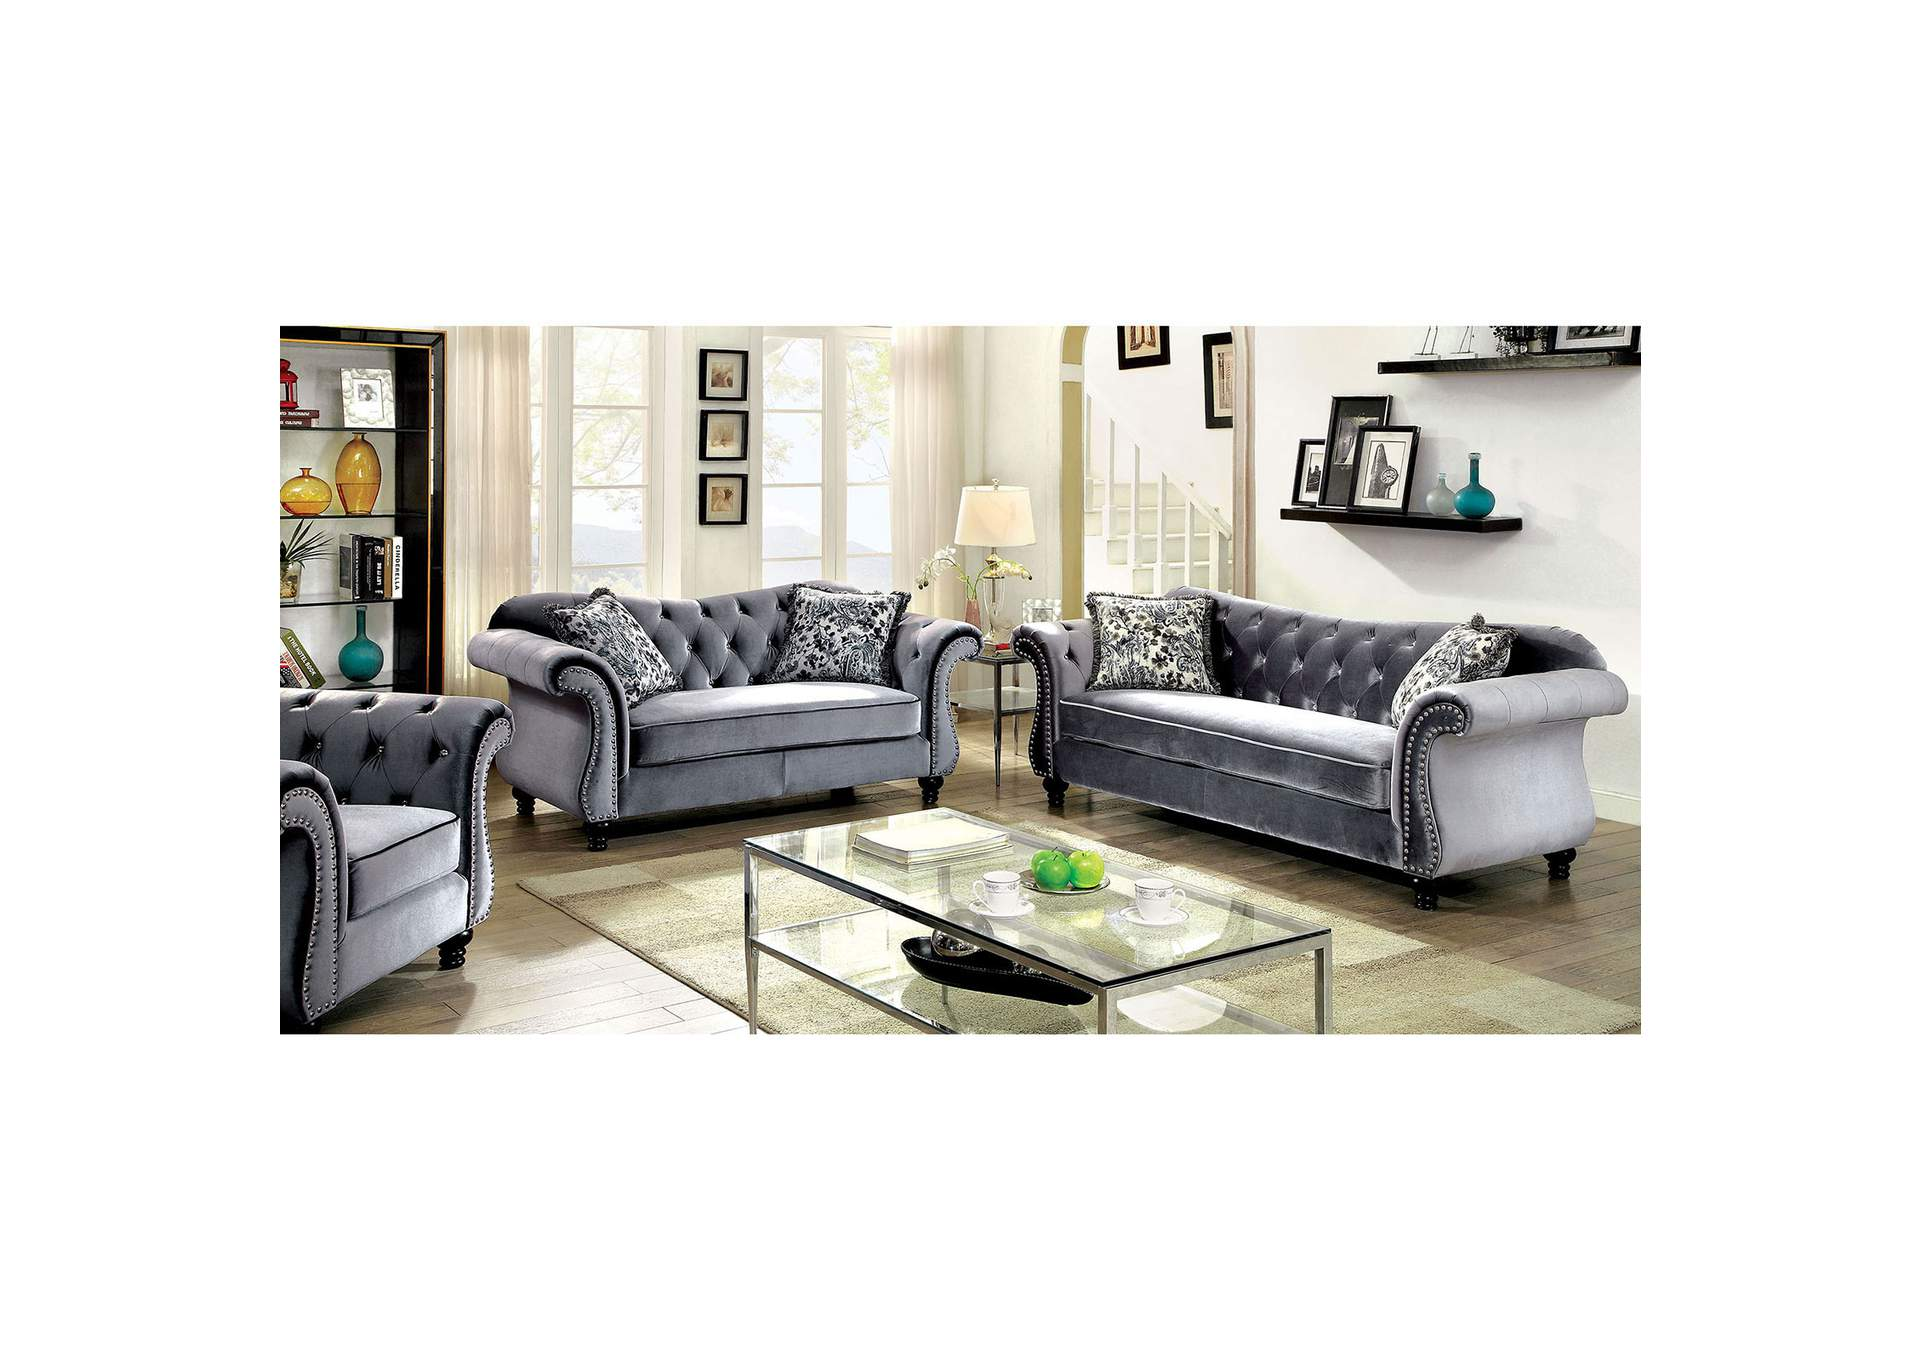 Jolanda Gray Curved Back Sofa And Loveseat,Furniture Of America